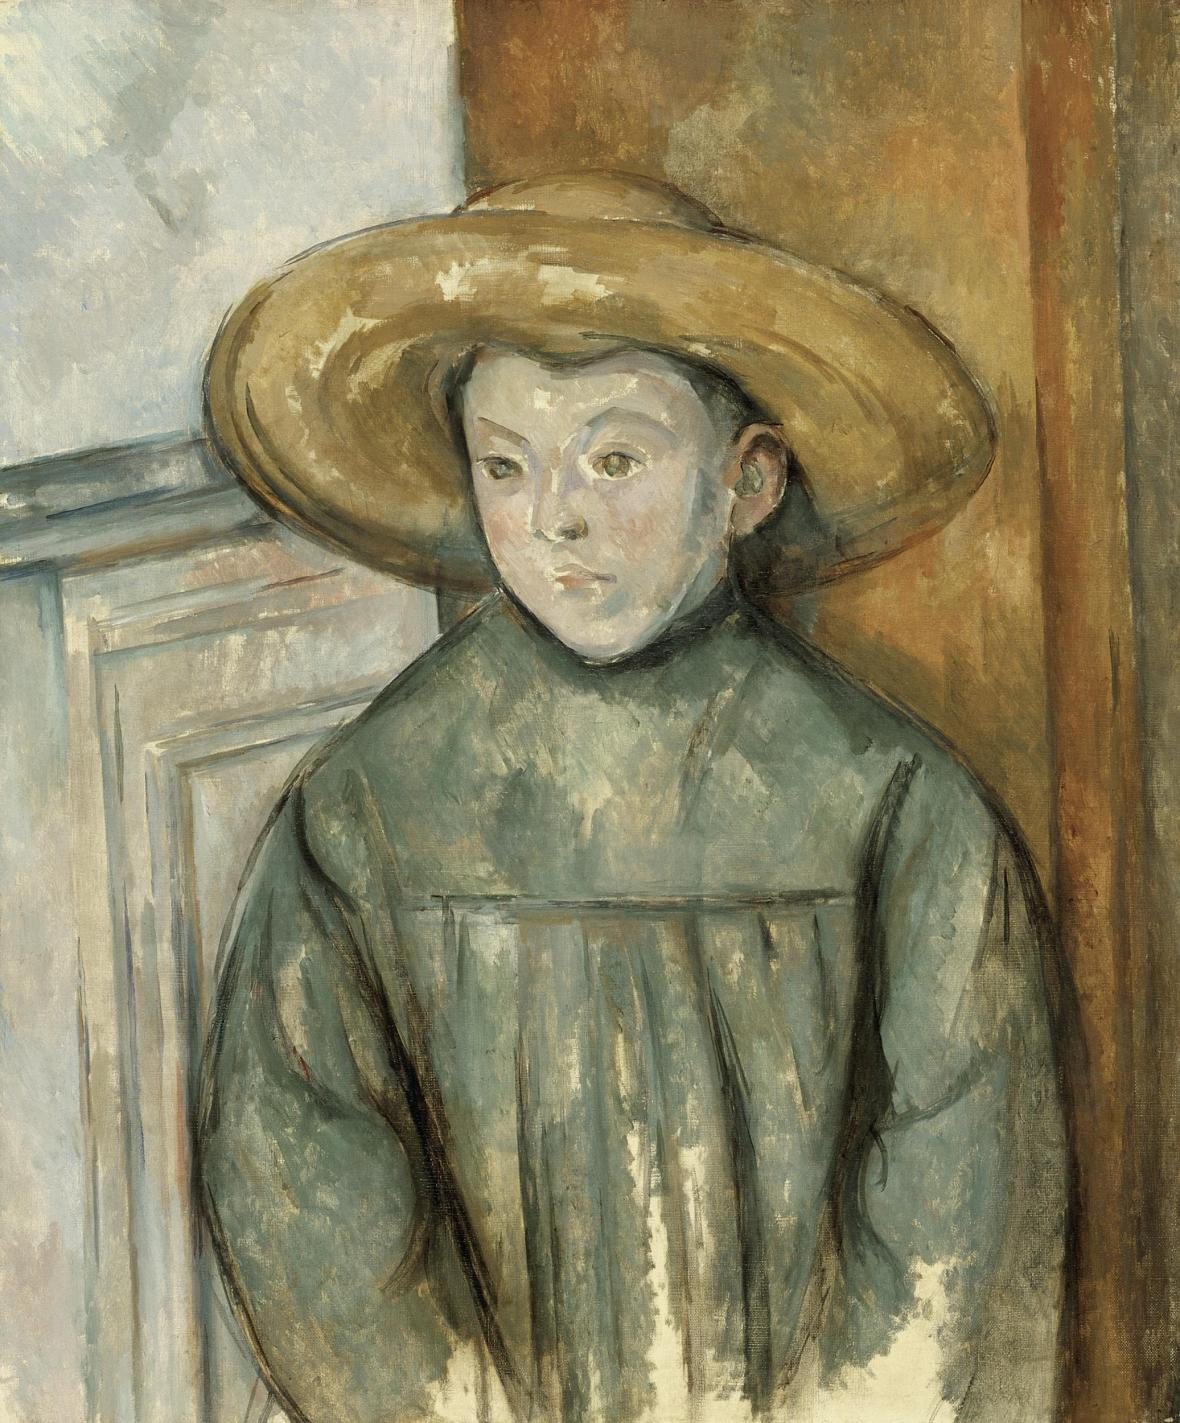 051-r813-child-in-a-straw-hat